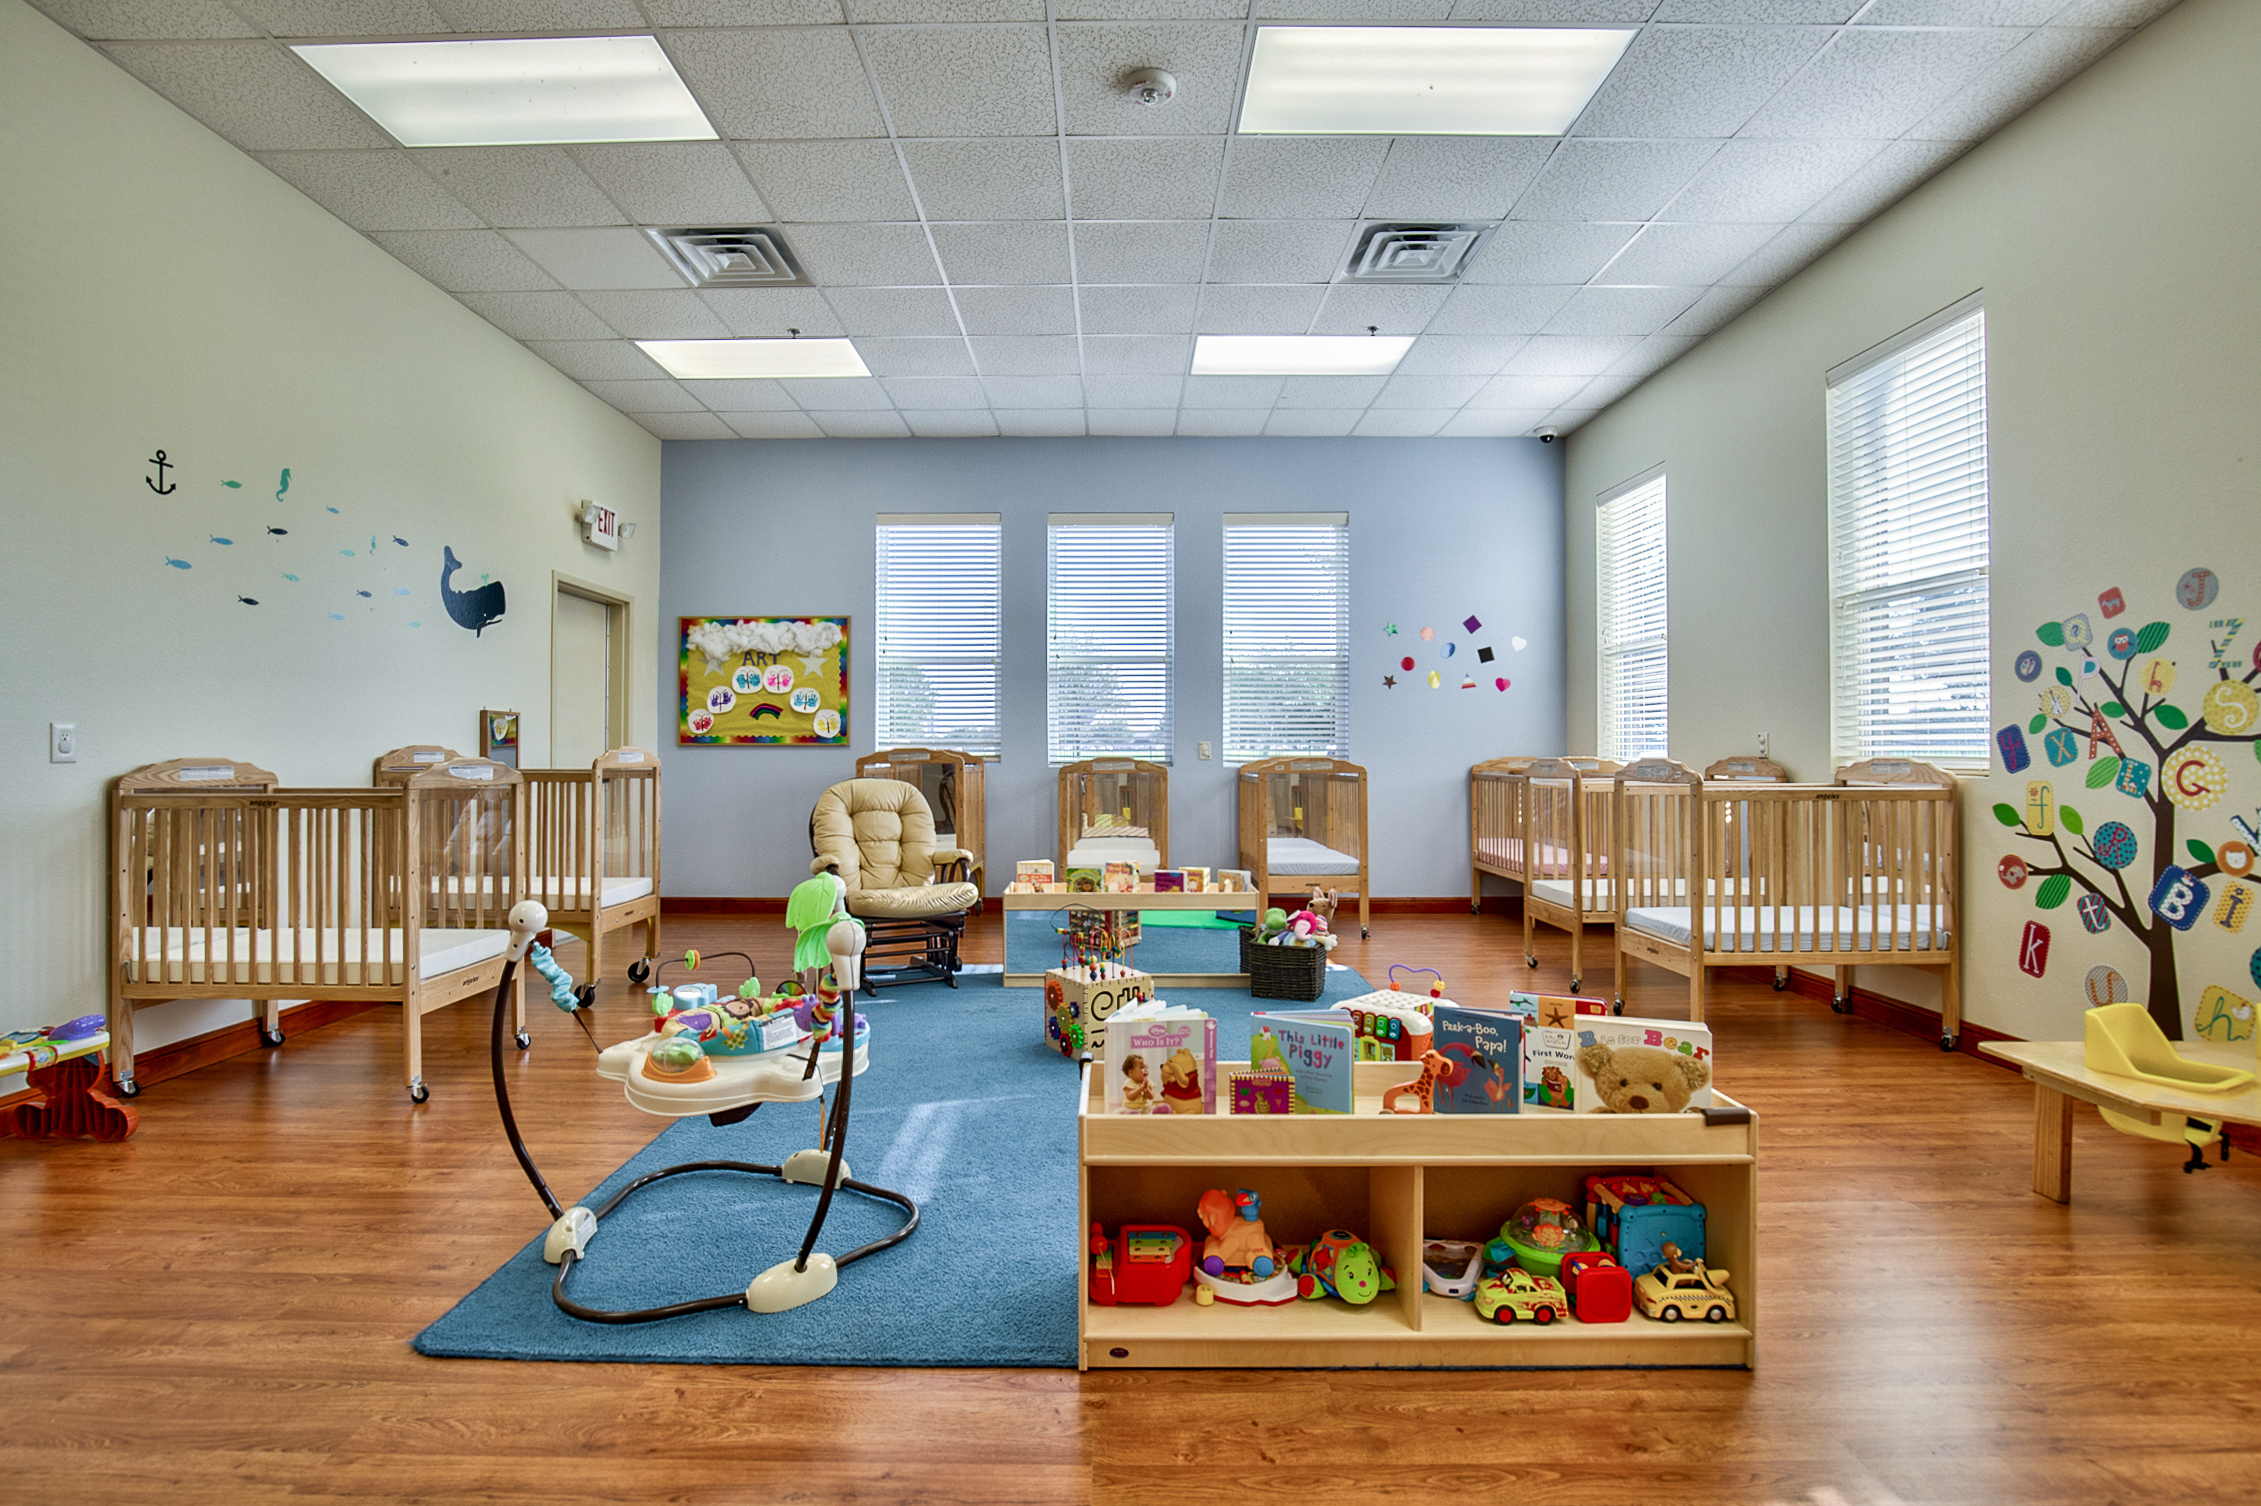 Infants program oak brook school allen oak brook for Interior design 6 months course